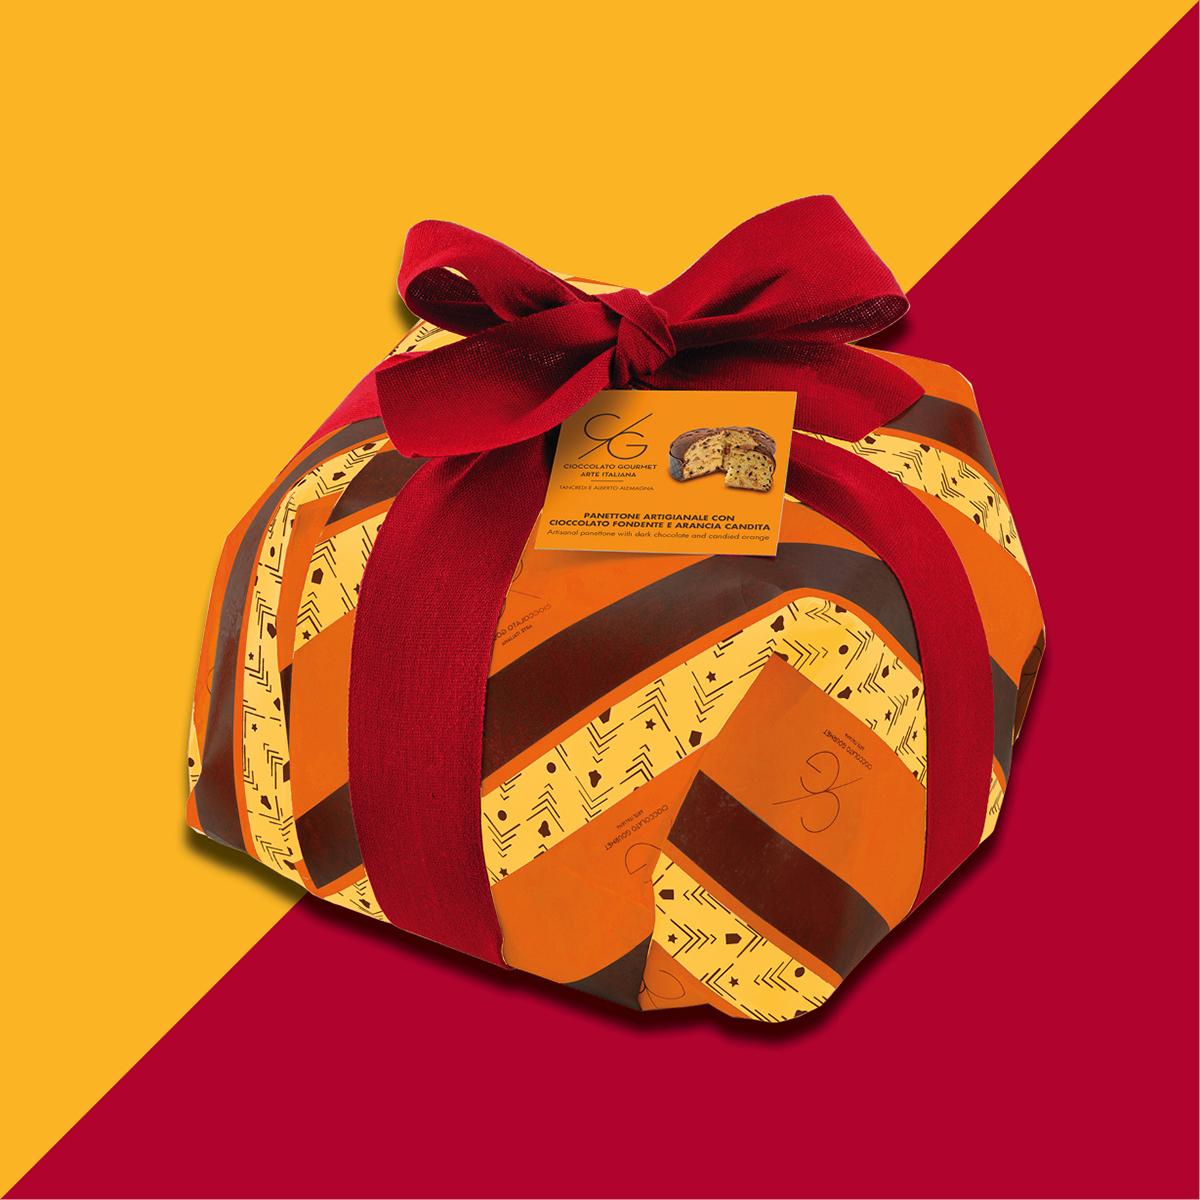 Artisanal panettone with chocolate and orange